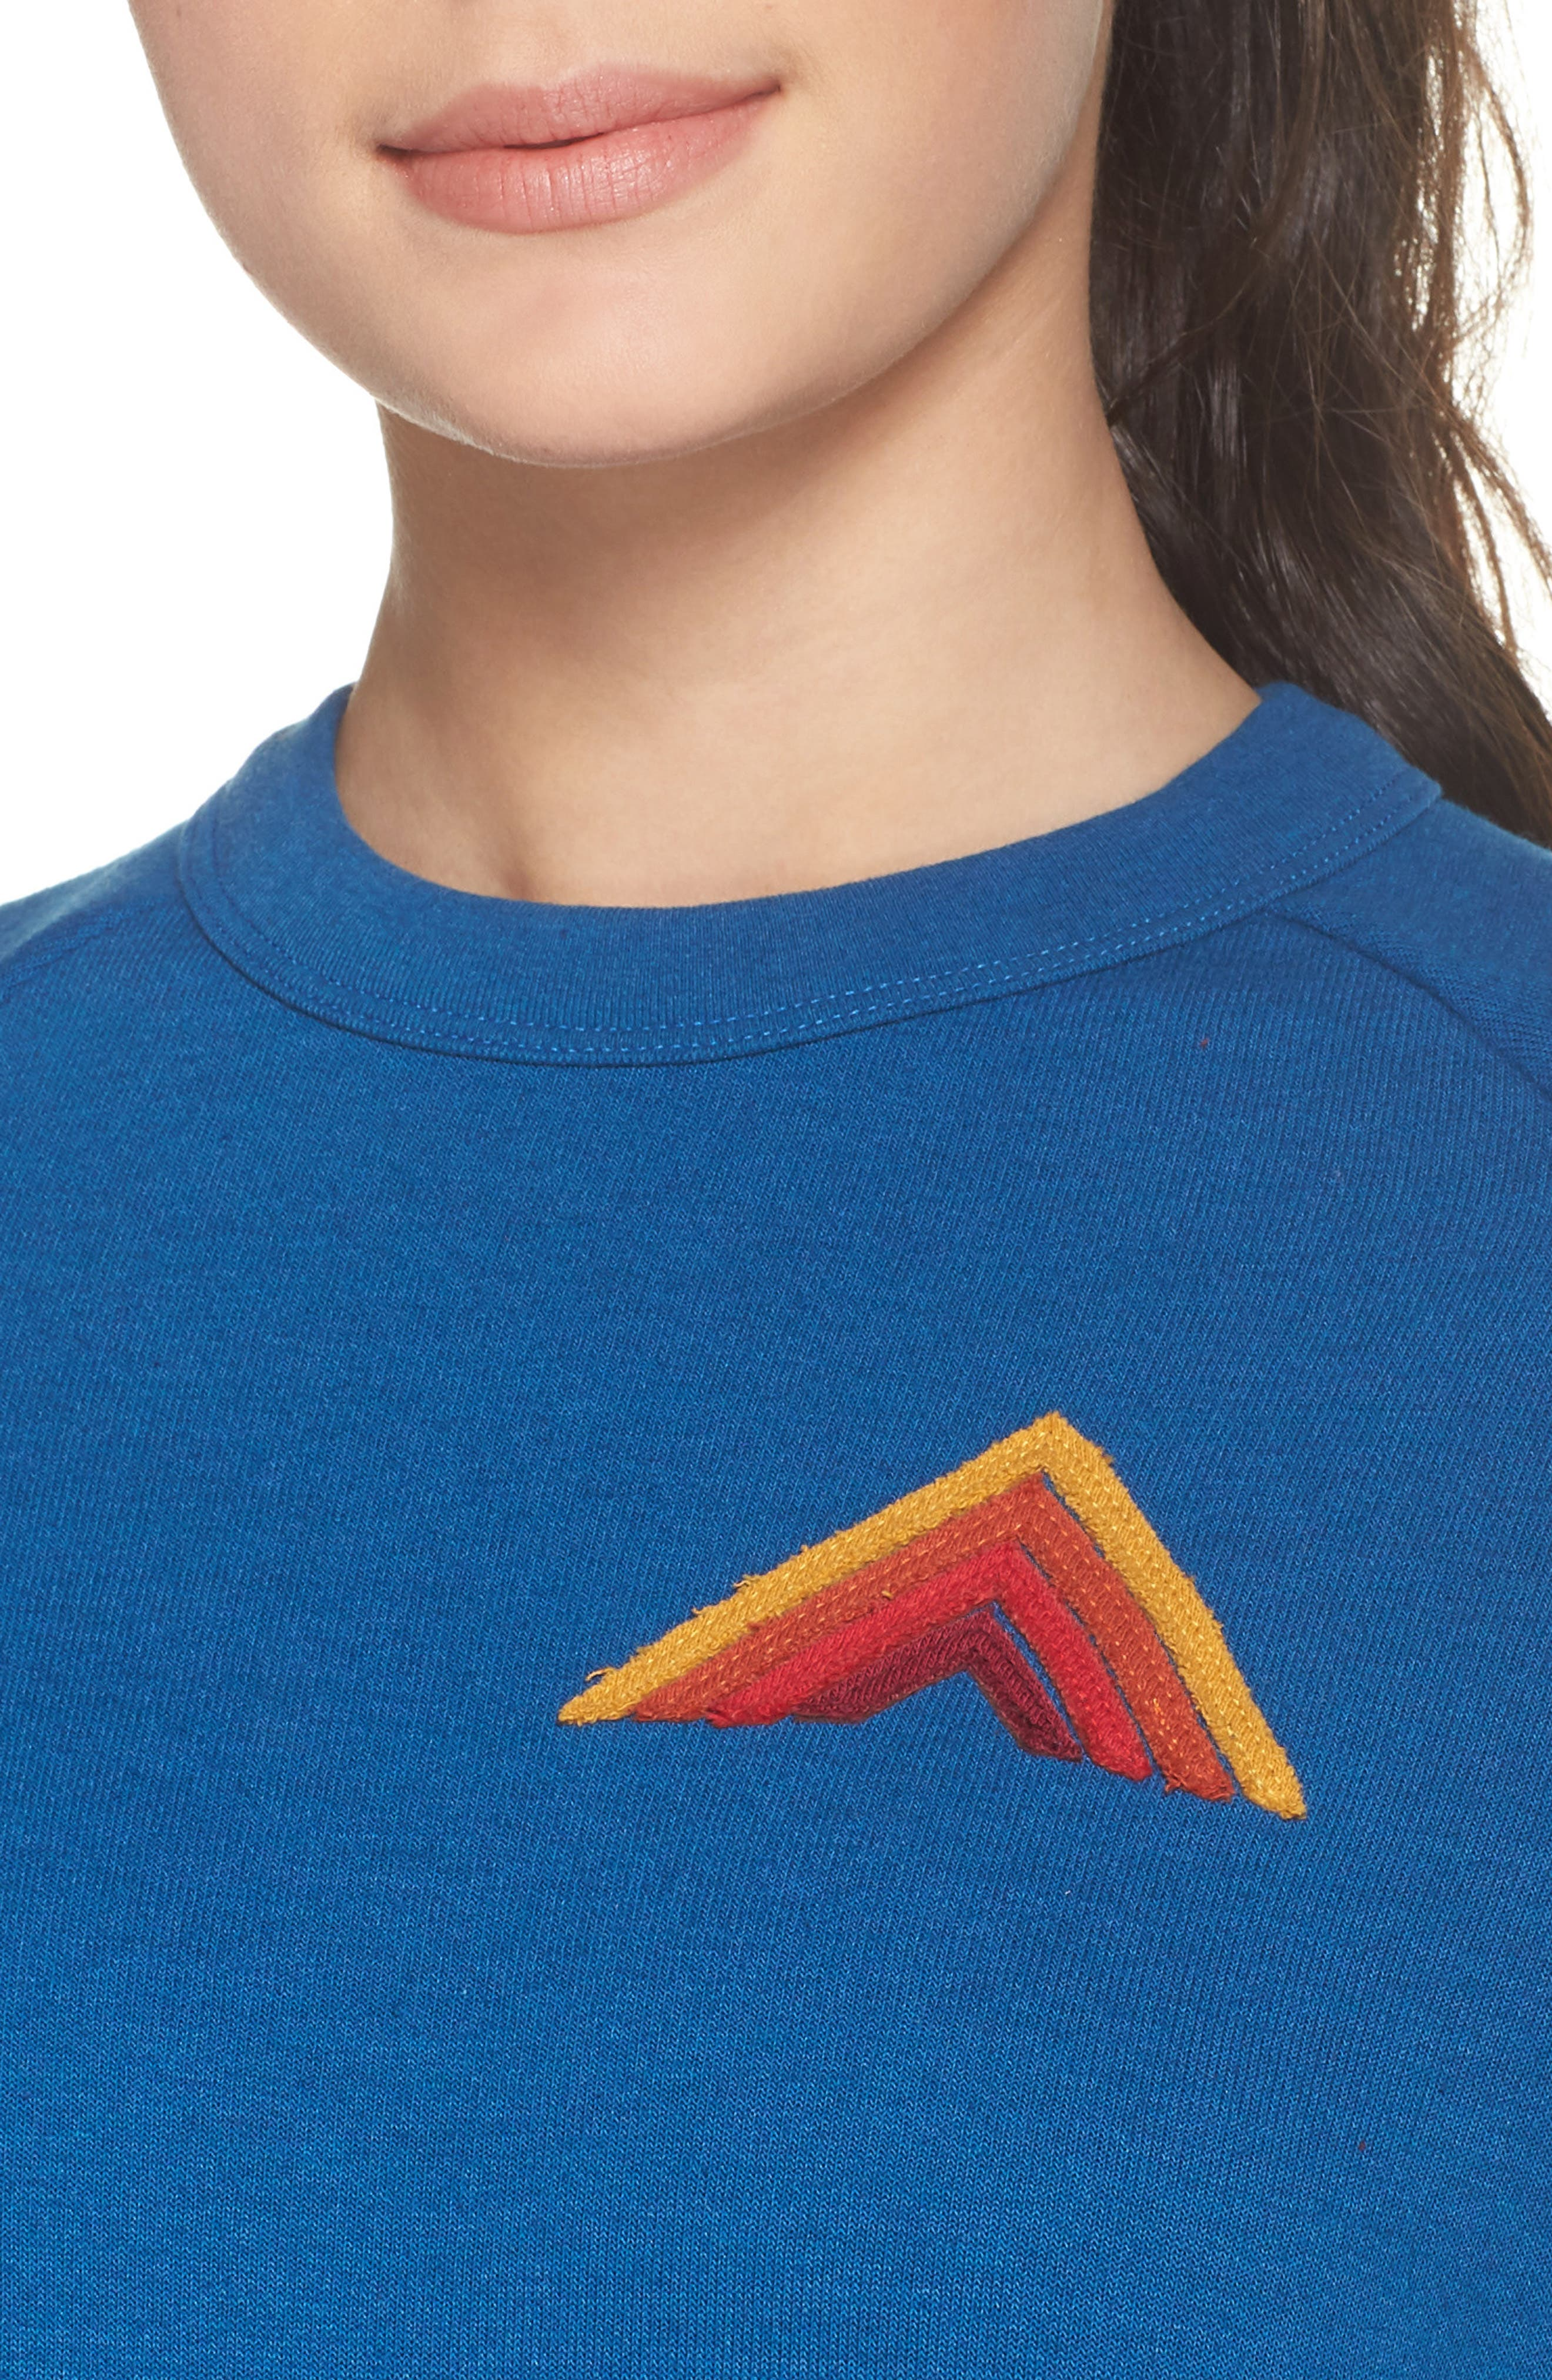 Mountain Stripe Crewneck Sweatshirt,                             Alternate thumbnail 4, color,                             Caribbean/ Red Stripes